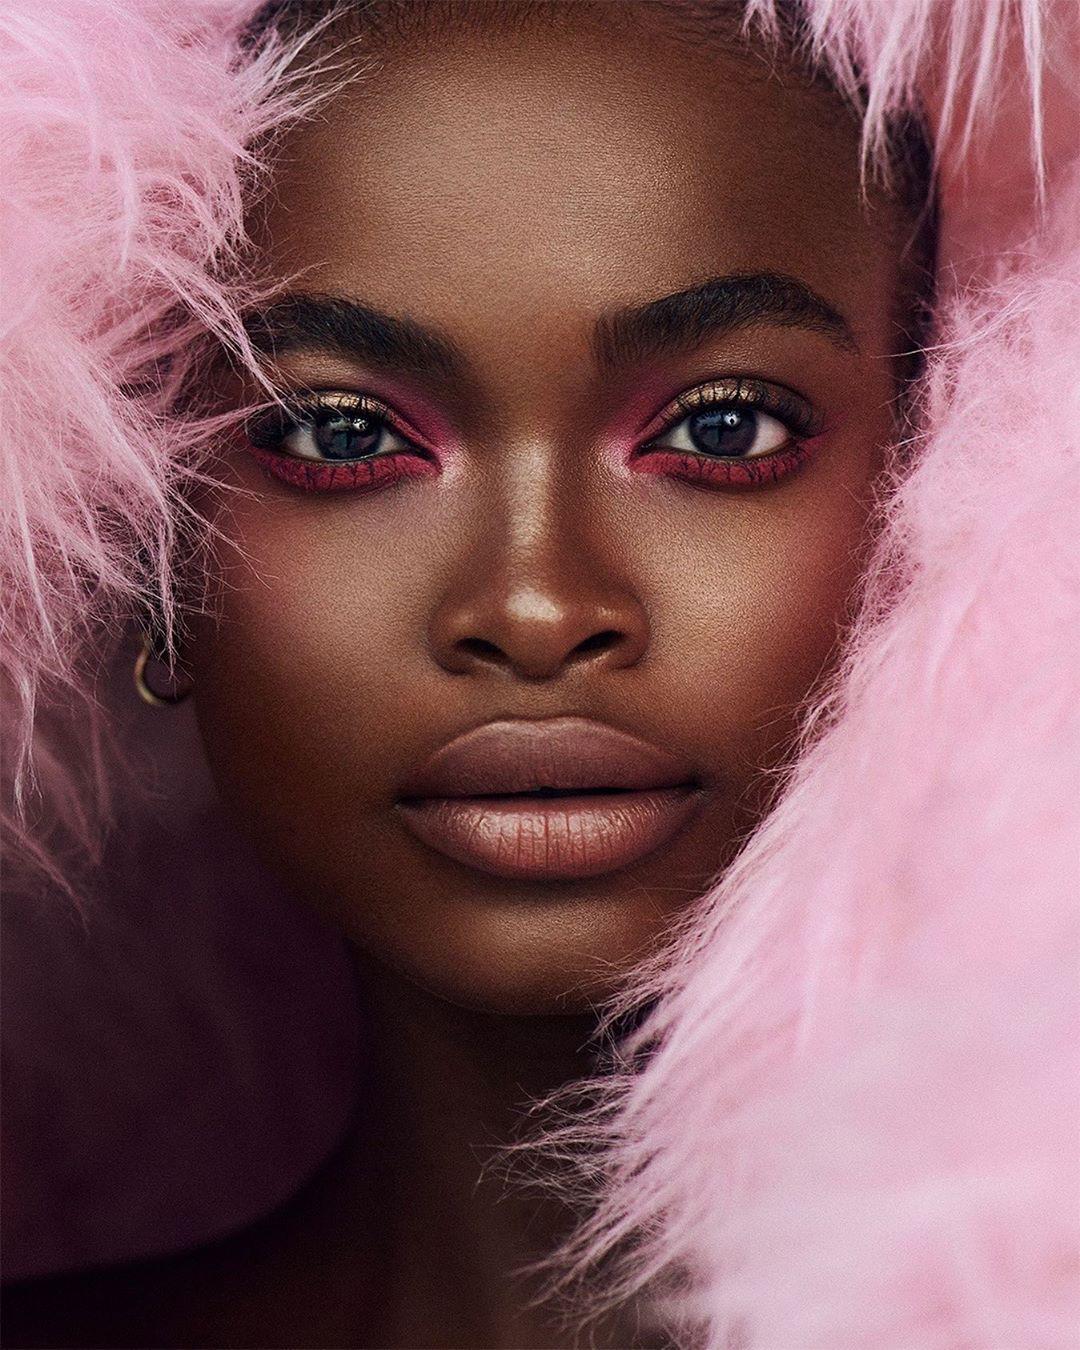 melanin-soft-glam-on-pink-fur-style-rave